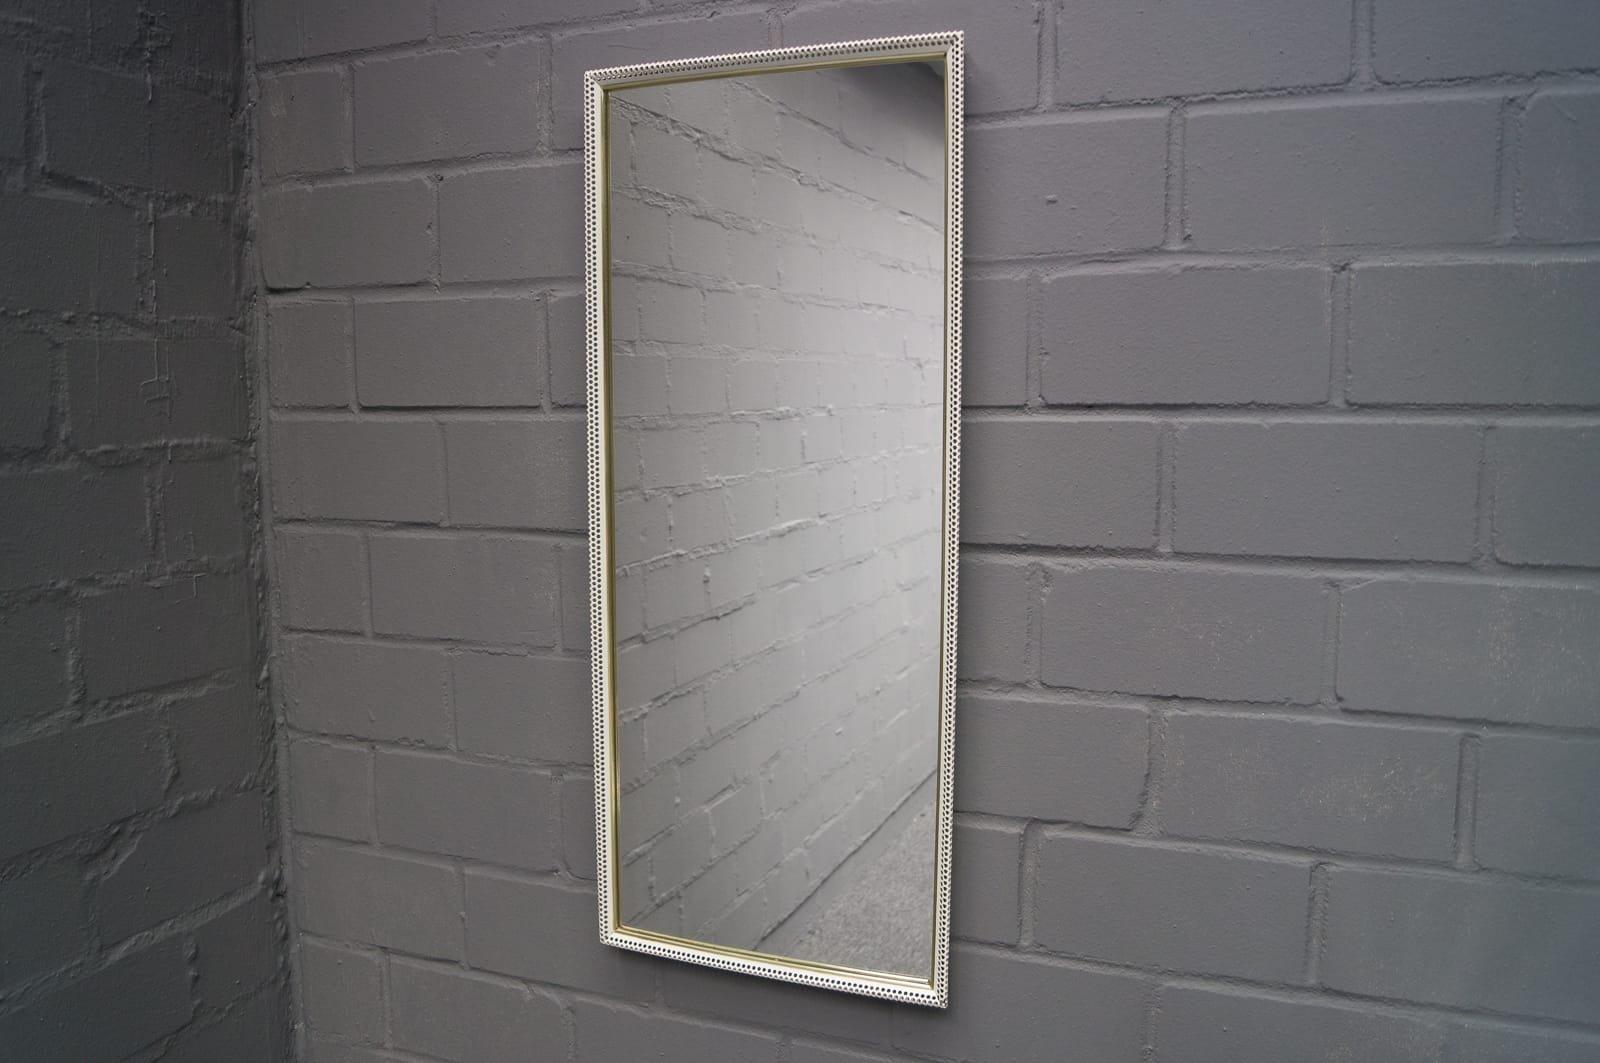 Grand miroir mural rectangulaire en m tal perfor peint de for Miroir mural metal